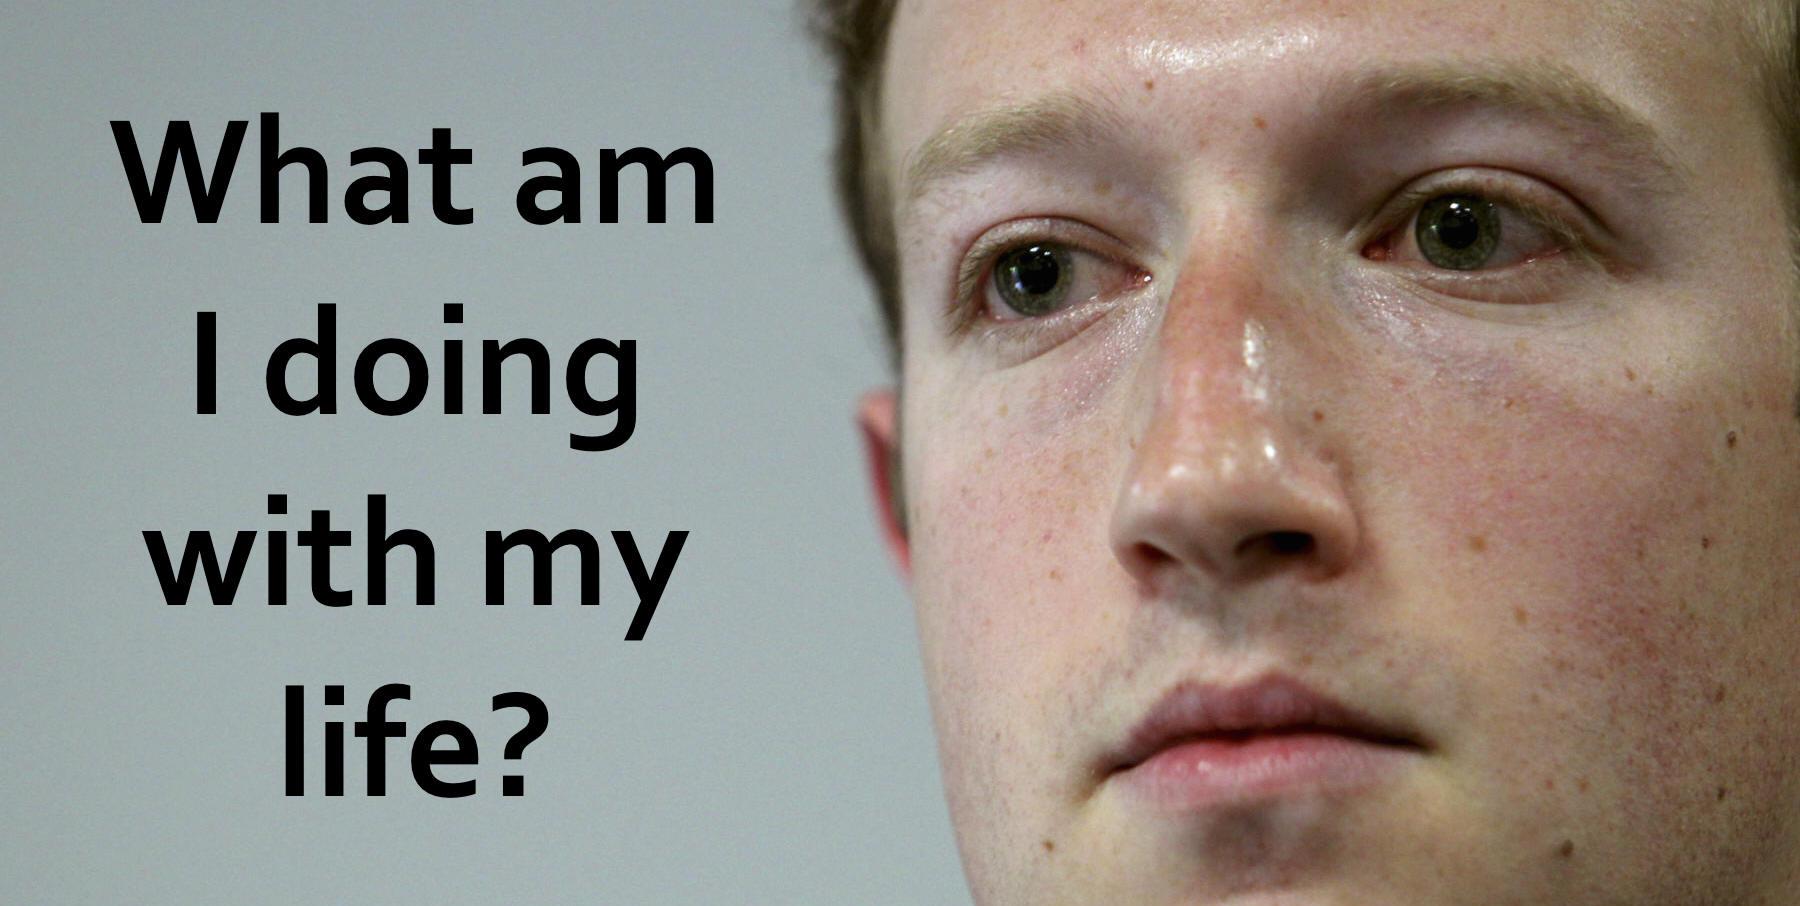 voc_it_www_social_facebook_1_pic_zuckerberg_may2010